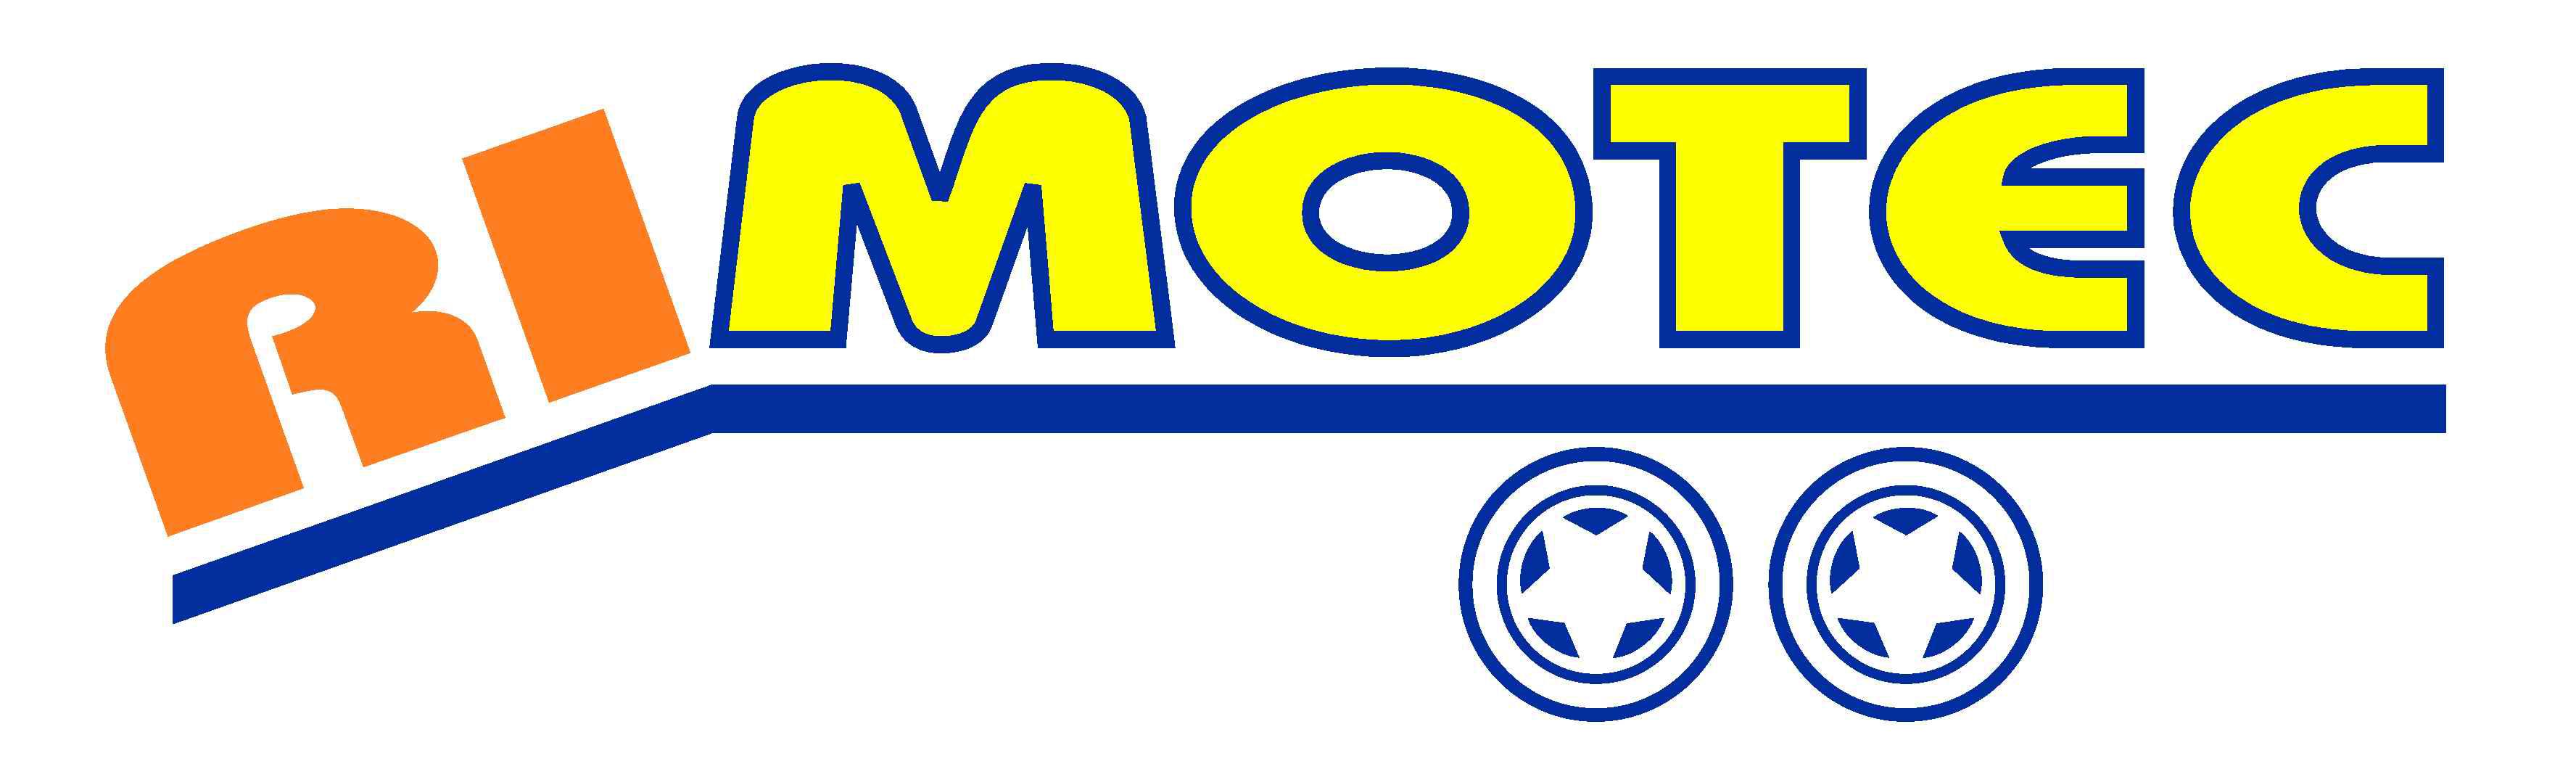 Logo Rimotec